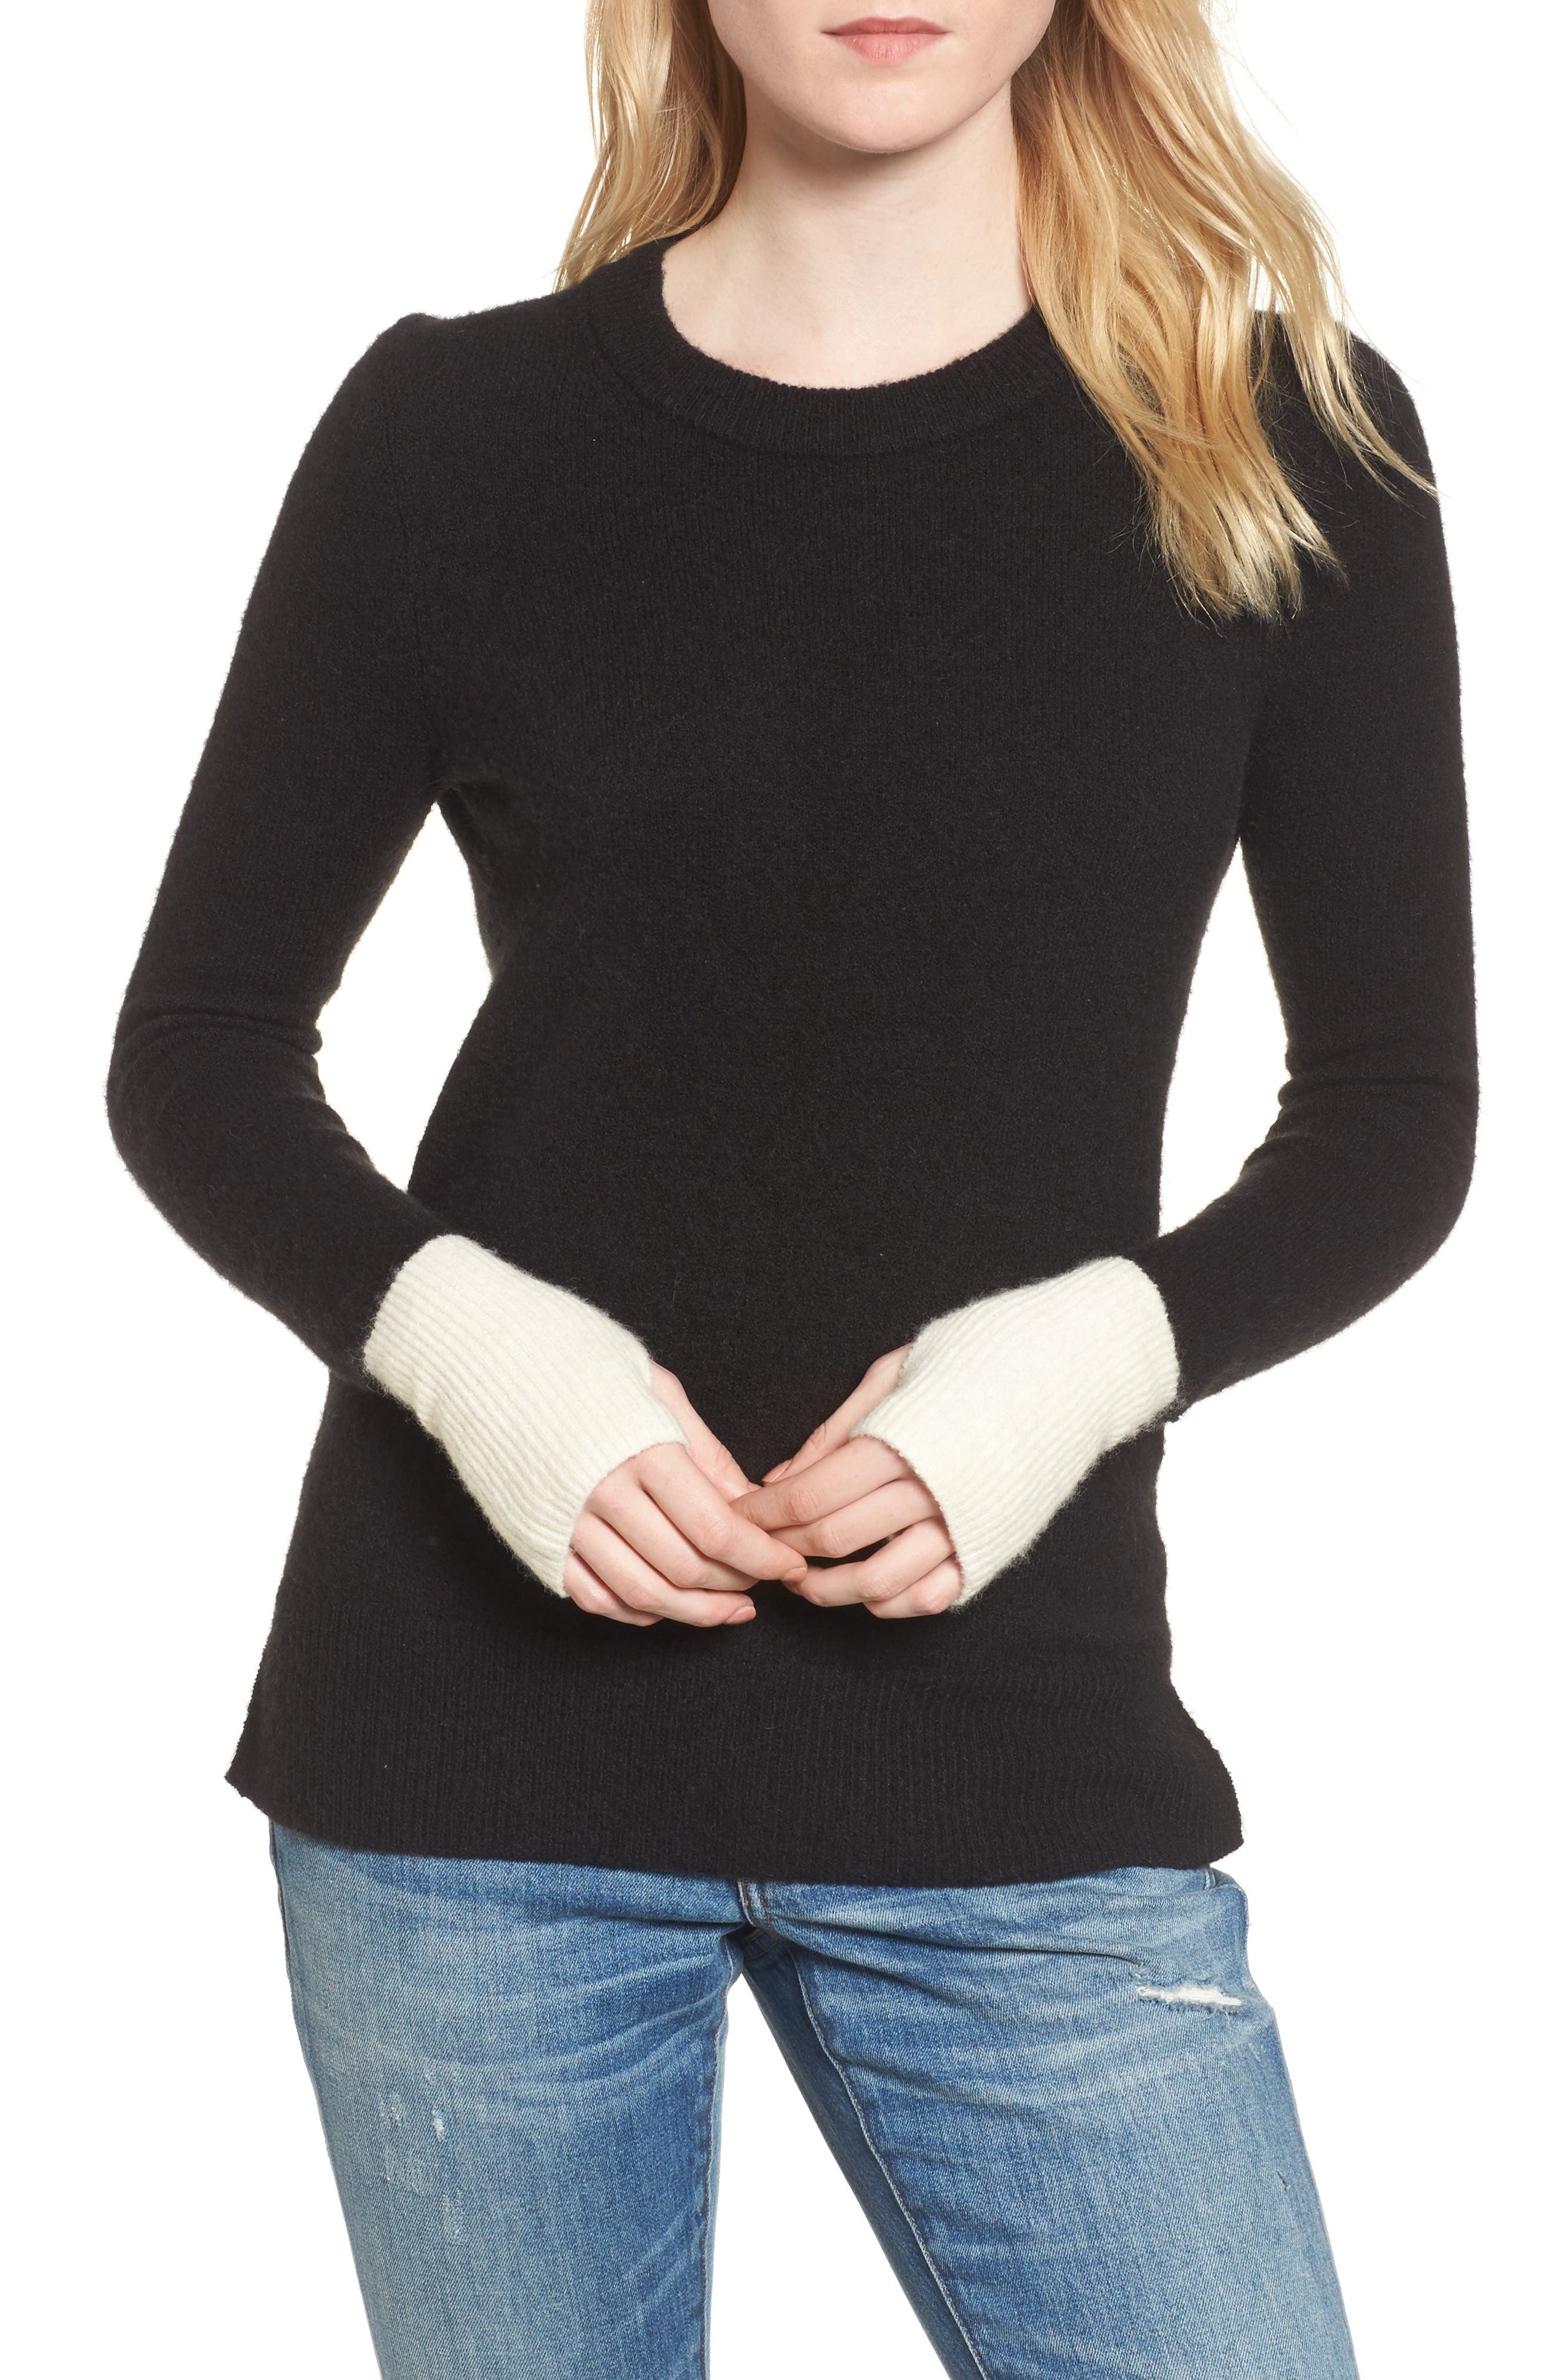 Fremont Colorblock Pullover Sweater,                         Main,                         color, True Black